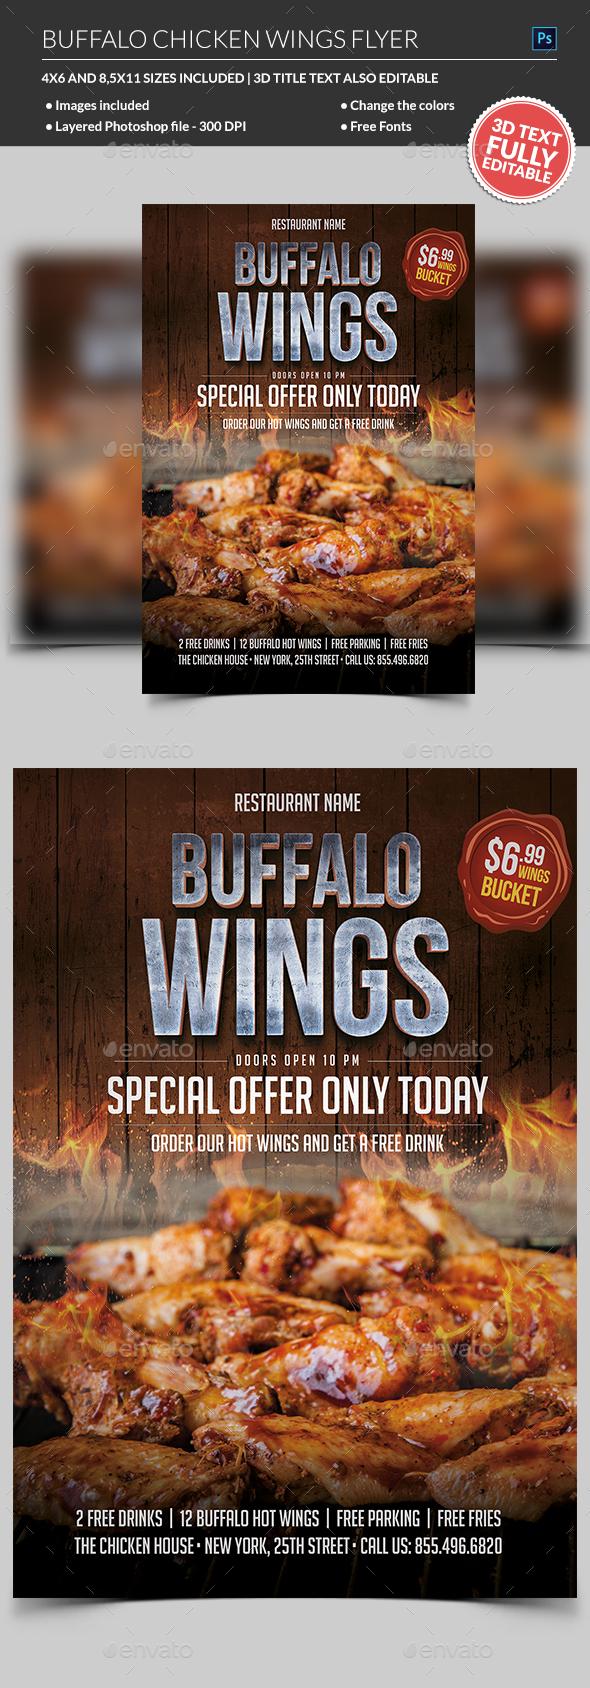 Chicken Wings Flyer - Restaurant Flyers